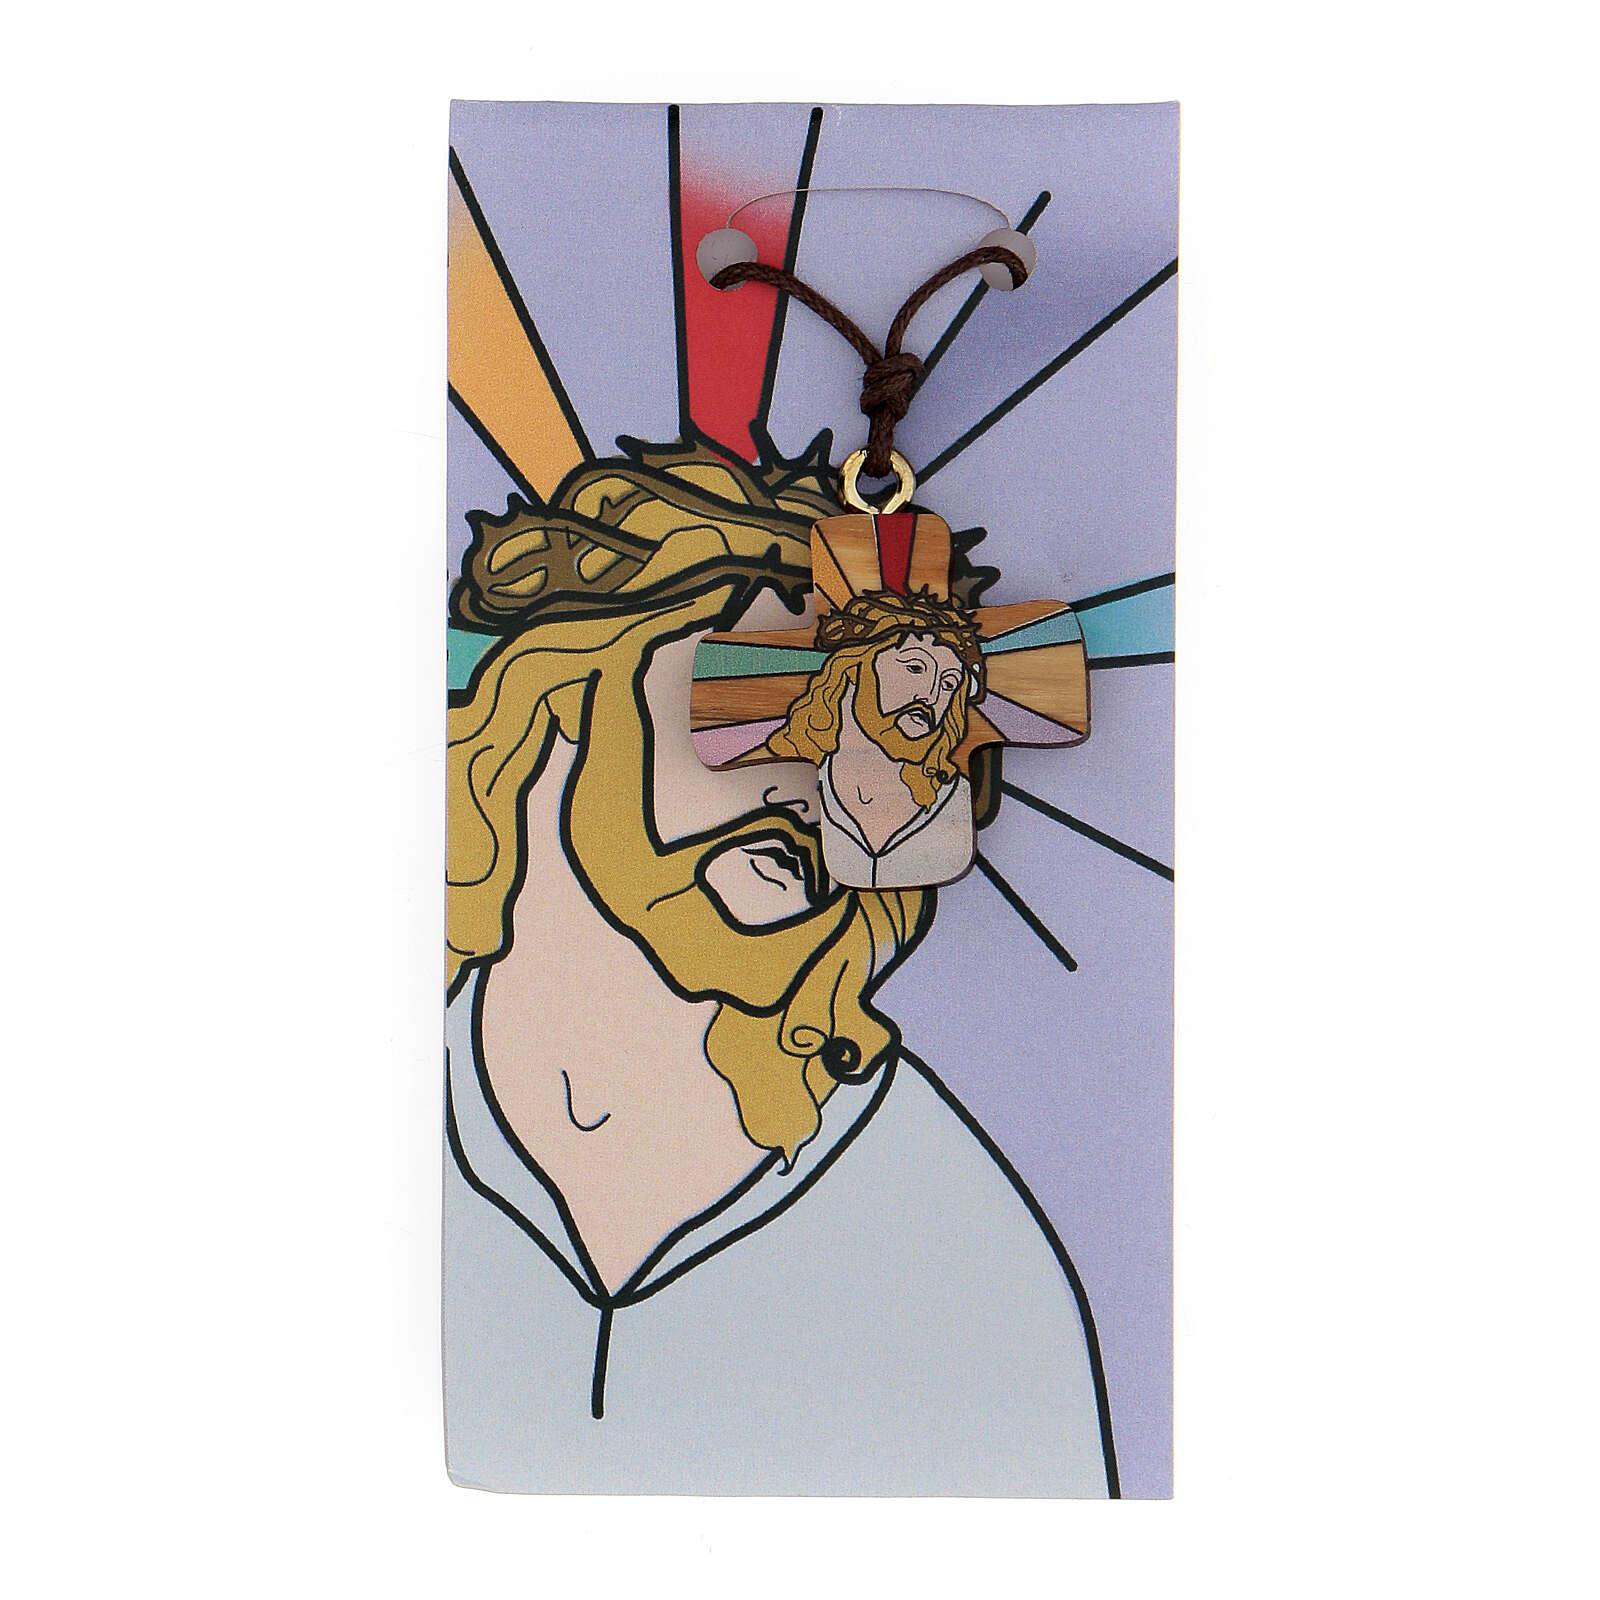 Croce Gesù stampato su ulivo 3